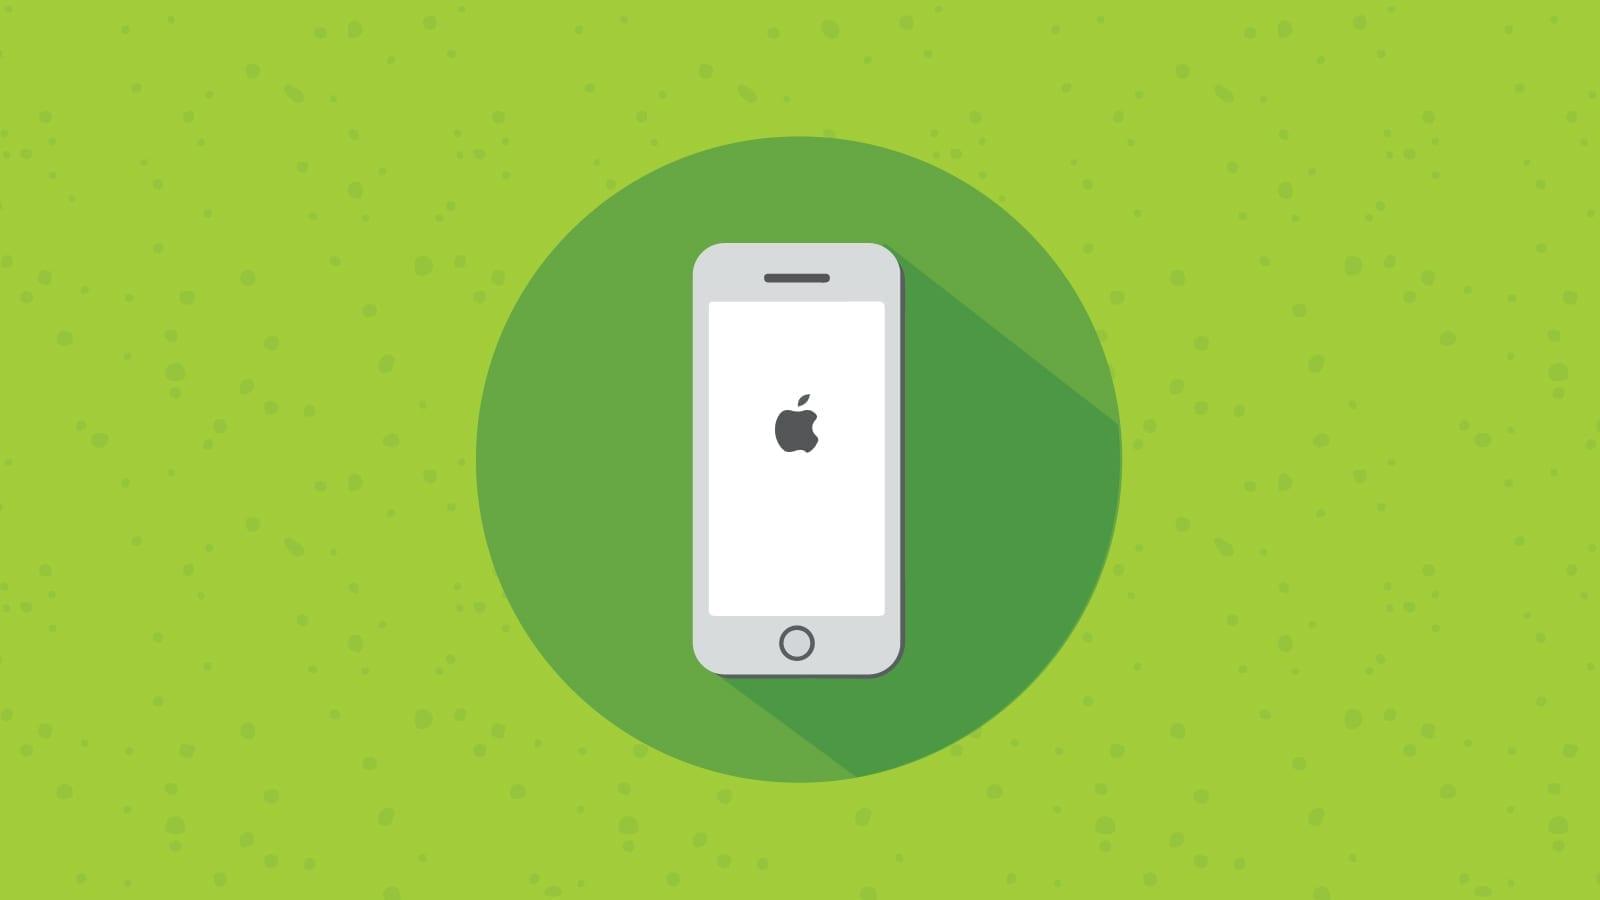 iPhone 6 frame test